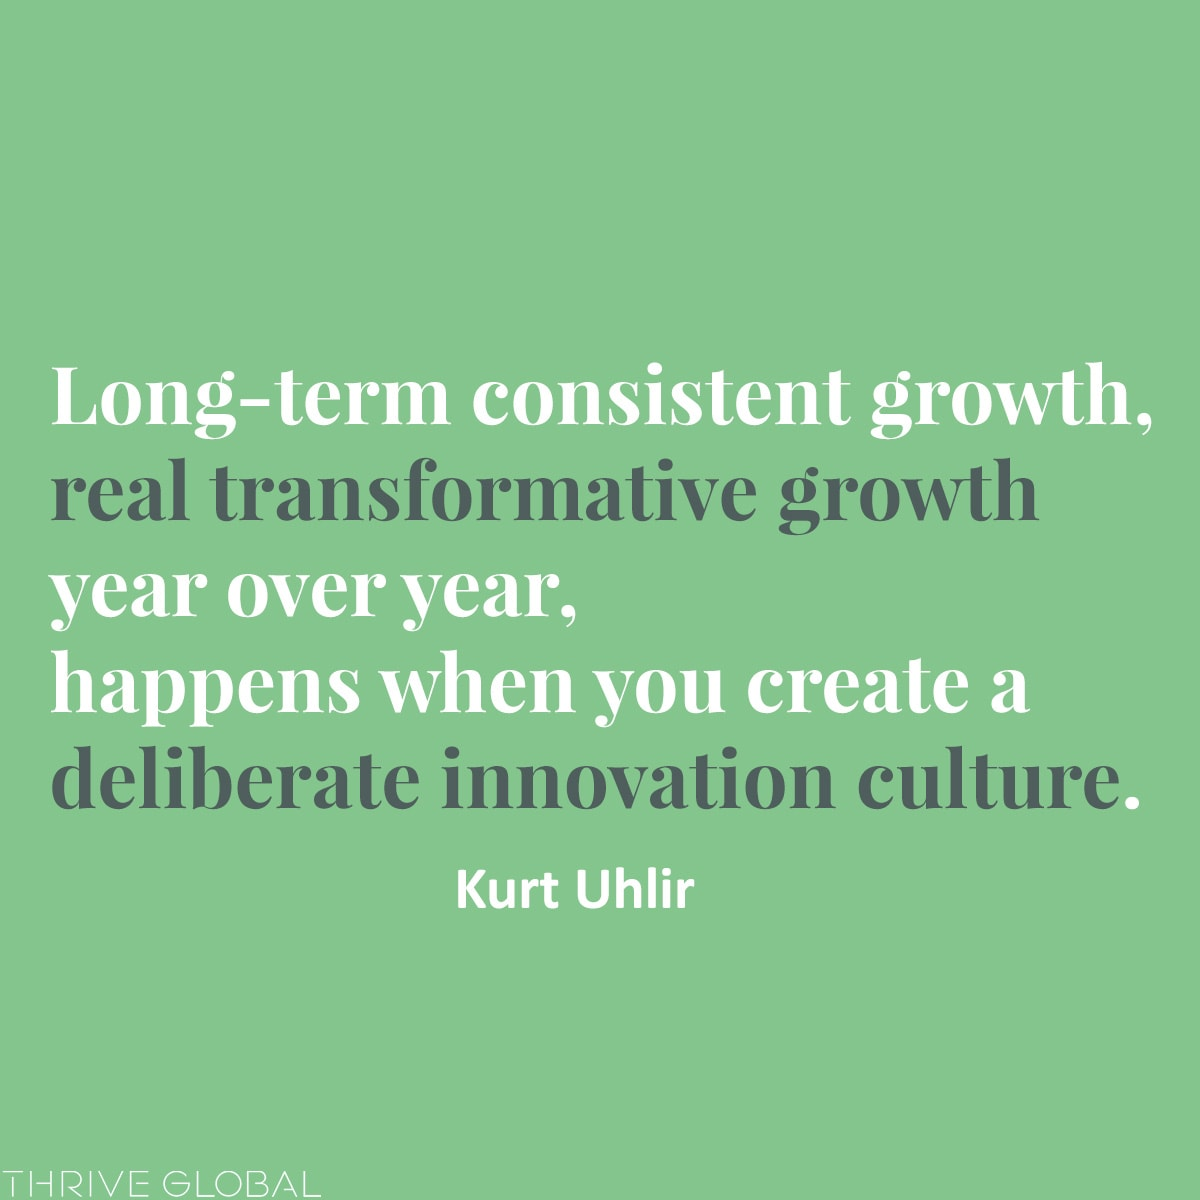 a deliberate innovation culture